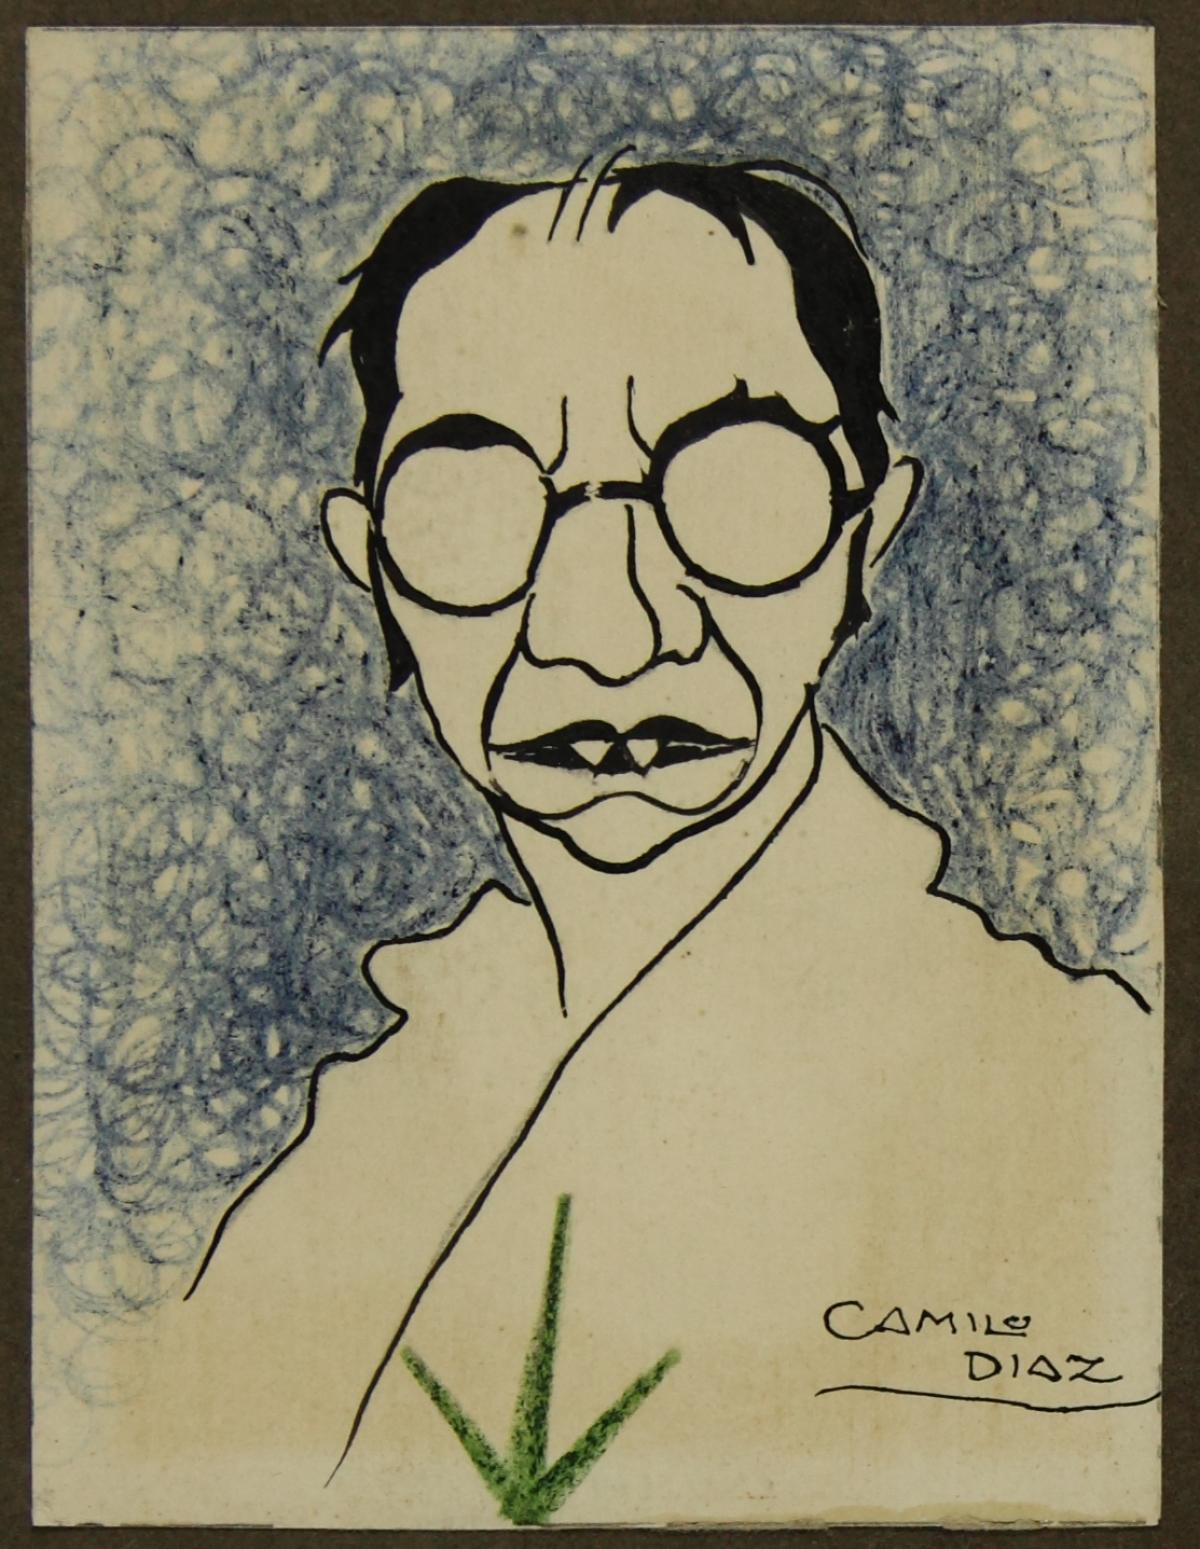 Caricatura de Camilo Díaz